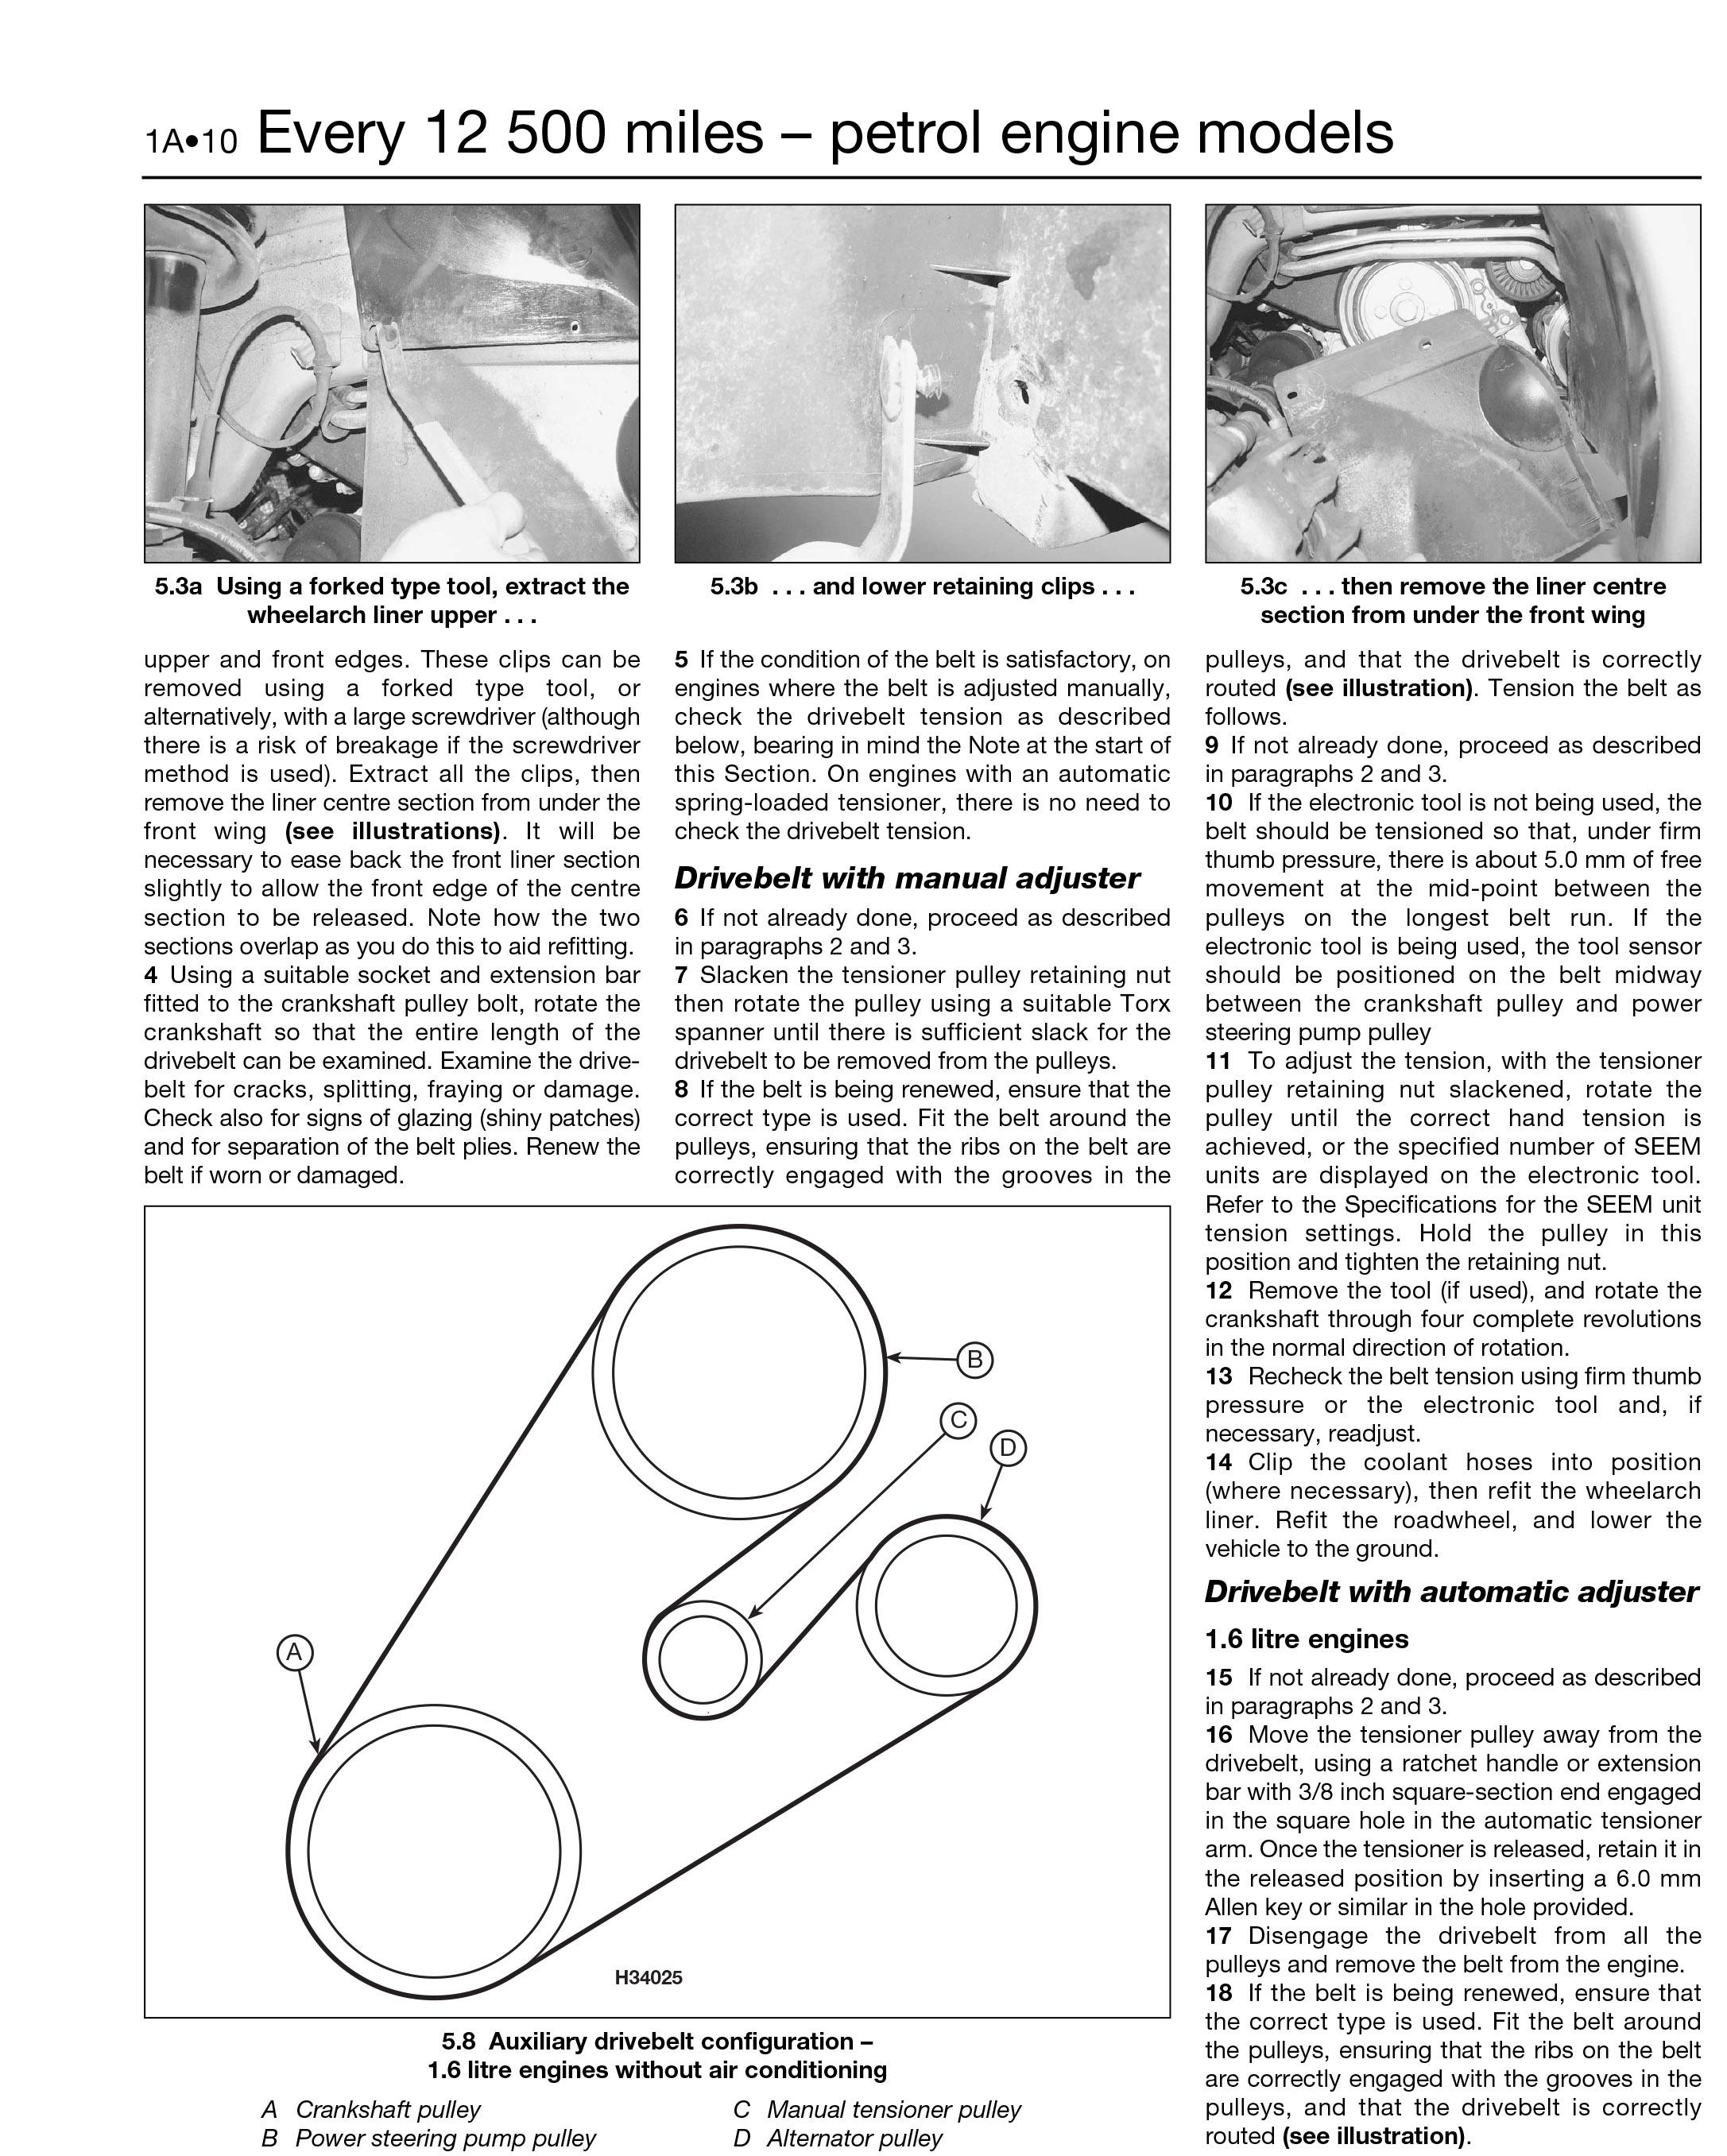 Citroen xsara estate wiring diagram new wiring diagram 2018 citroen xsara picasso petrol diesel 00 02 haynes repair citroen xsara coupe xsara wrc citroen traction avant on citroen xsara estate wiring diagram asfbconference2016 Choice Image